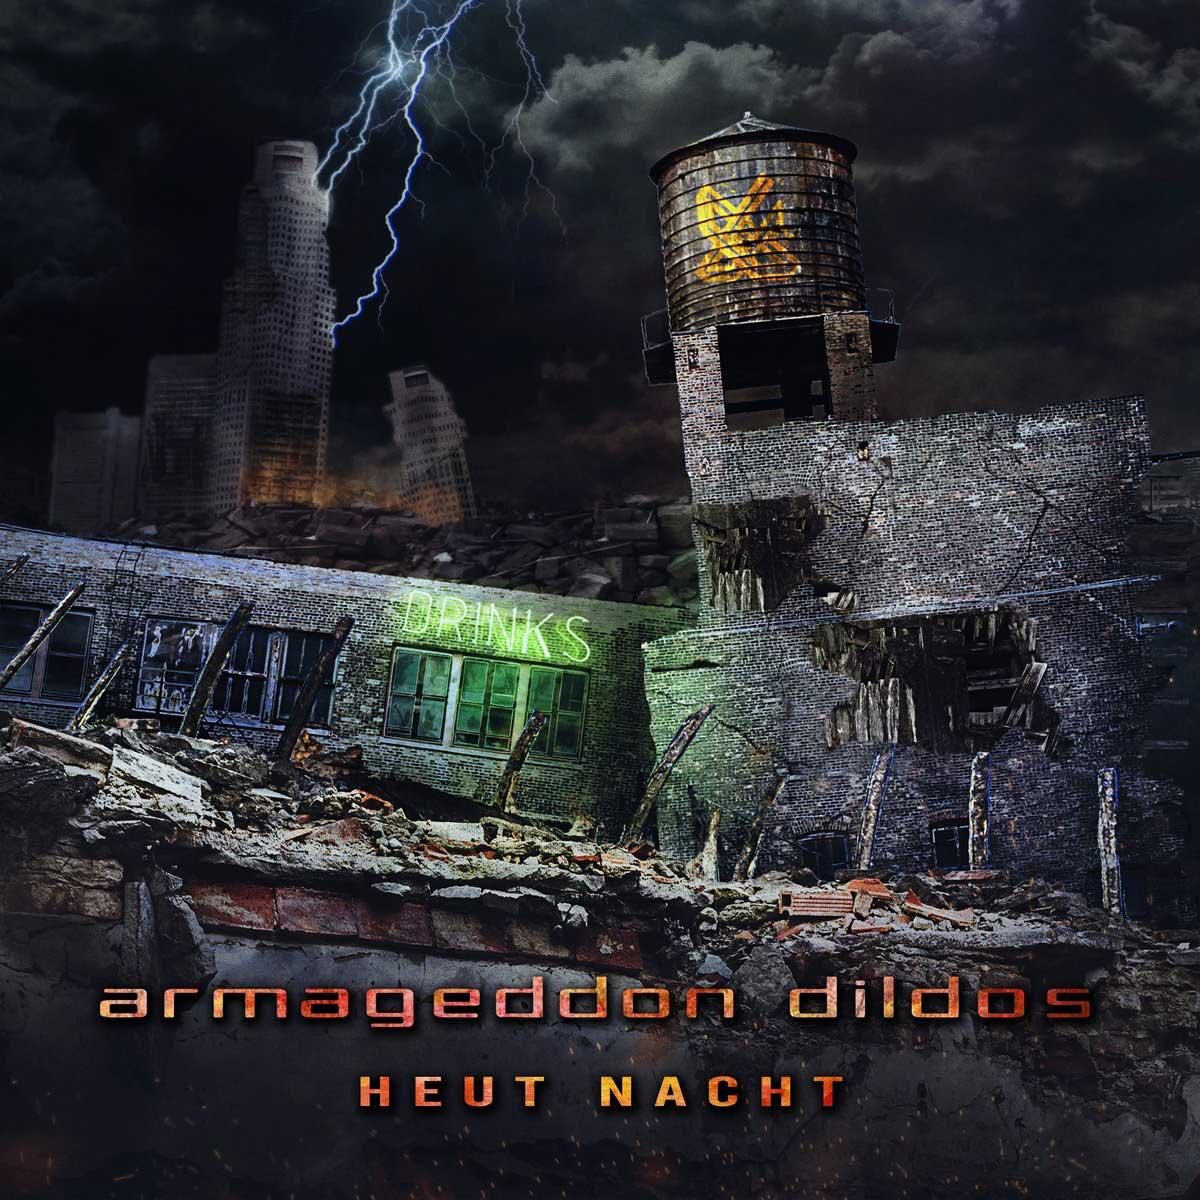 Armageddon Dildos – Heut Nacht - Armageddon Dildos – Heut Nacht